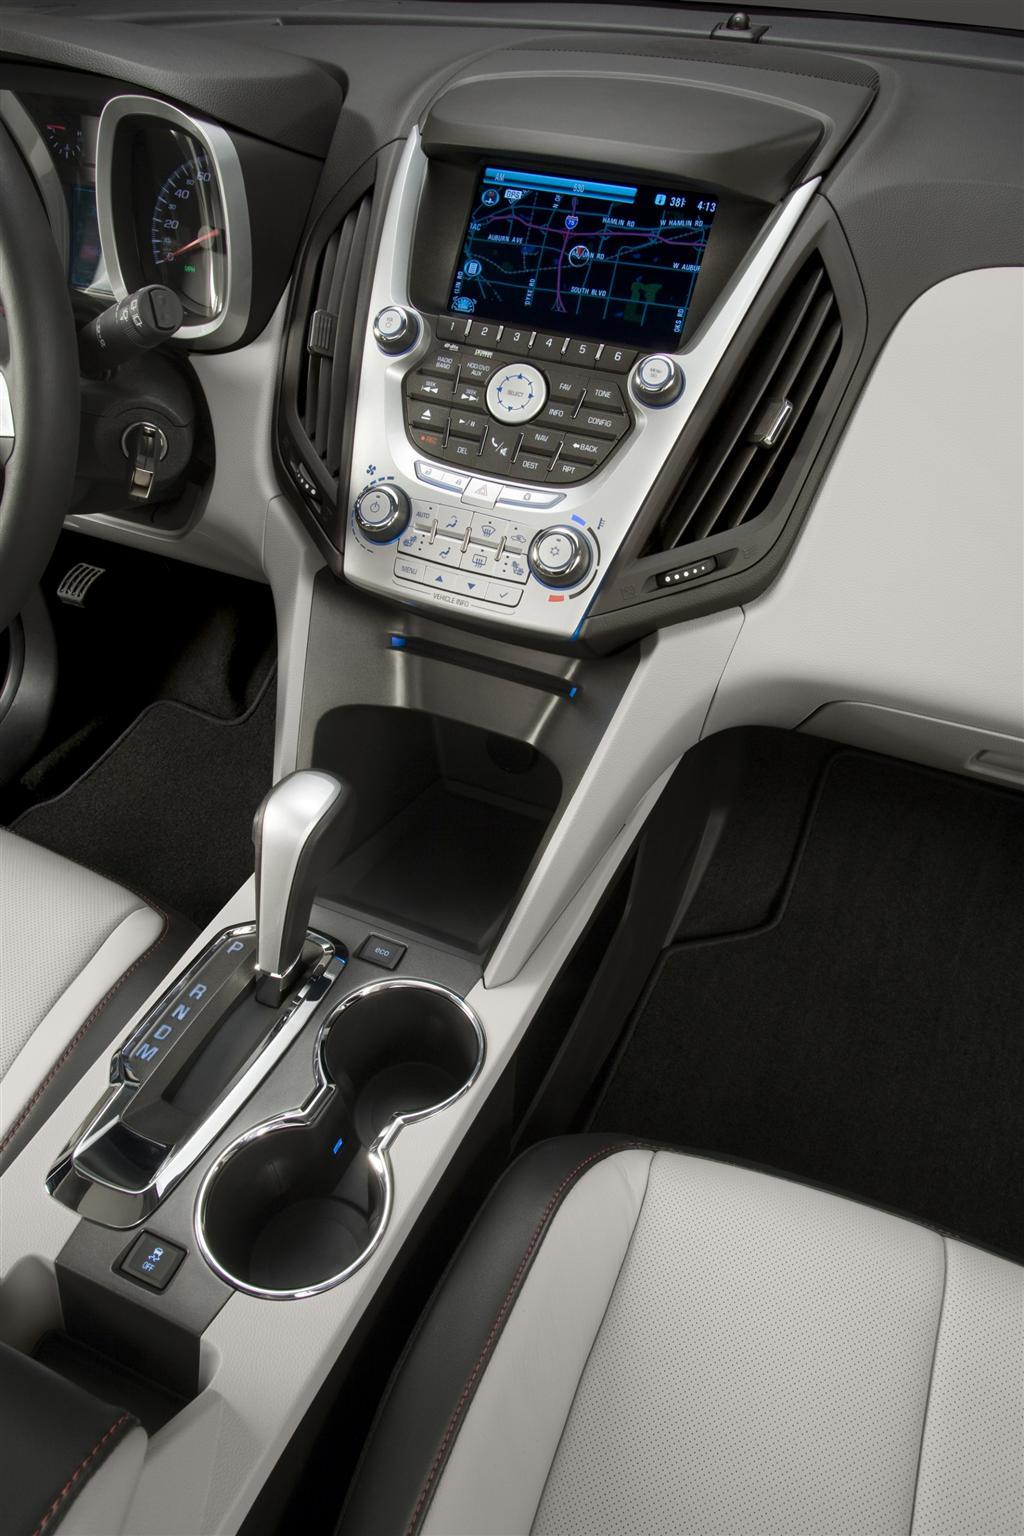 Equinox 2011 chevy equinox value : 2011 Chevrolet Equinox - conceptcarz.com